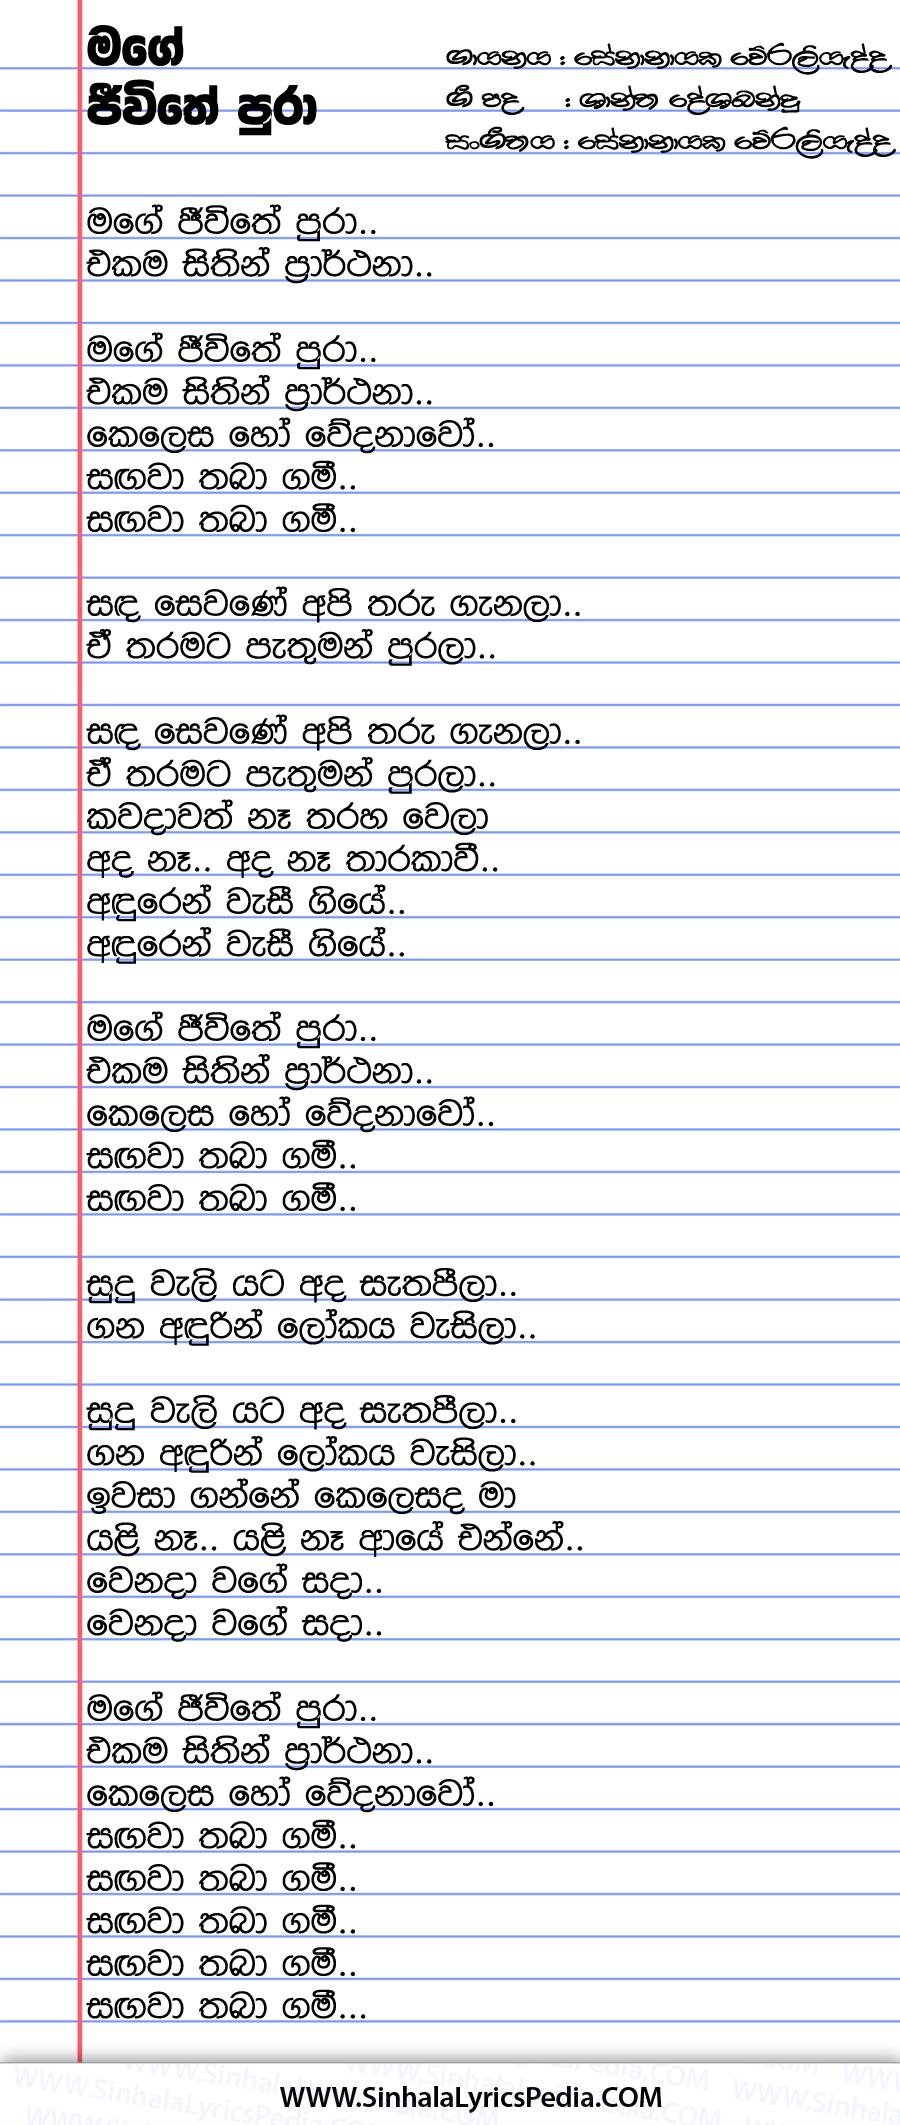 Mage Jeewithe Pura Song Lyrics